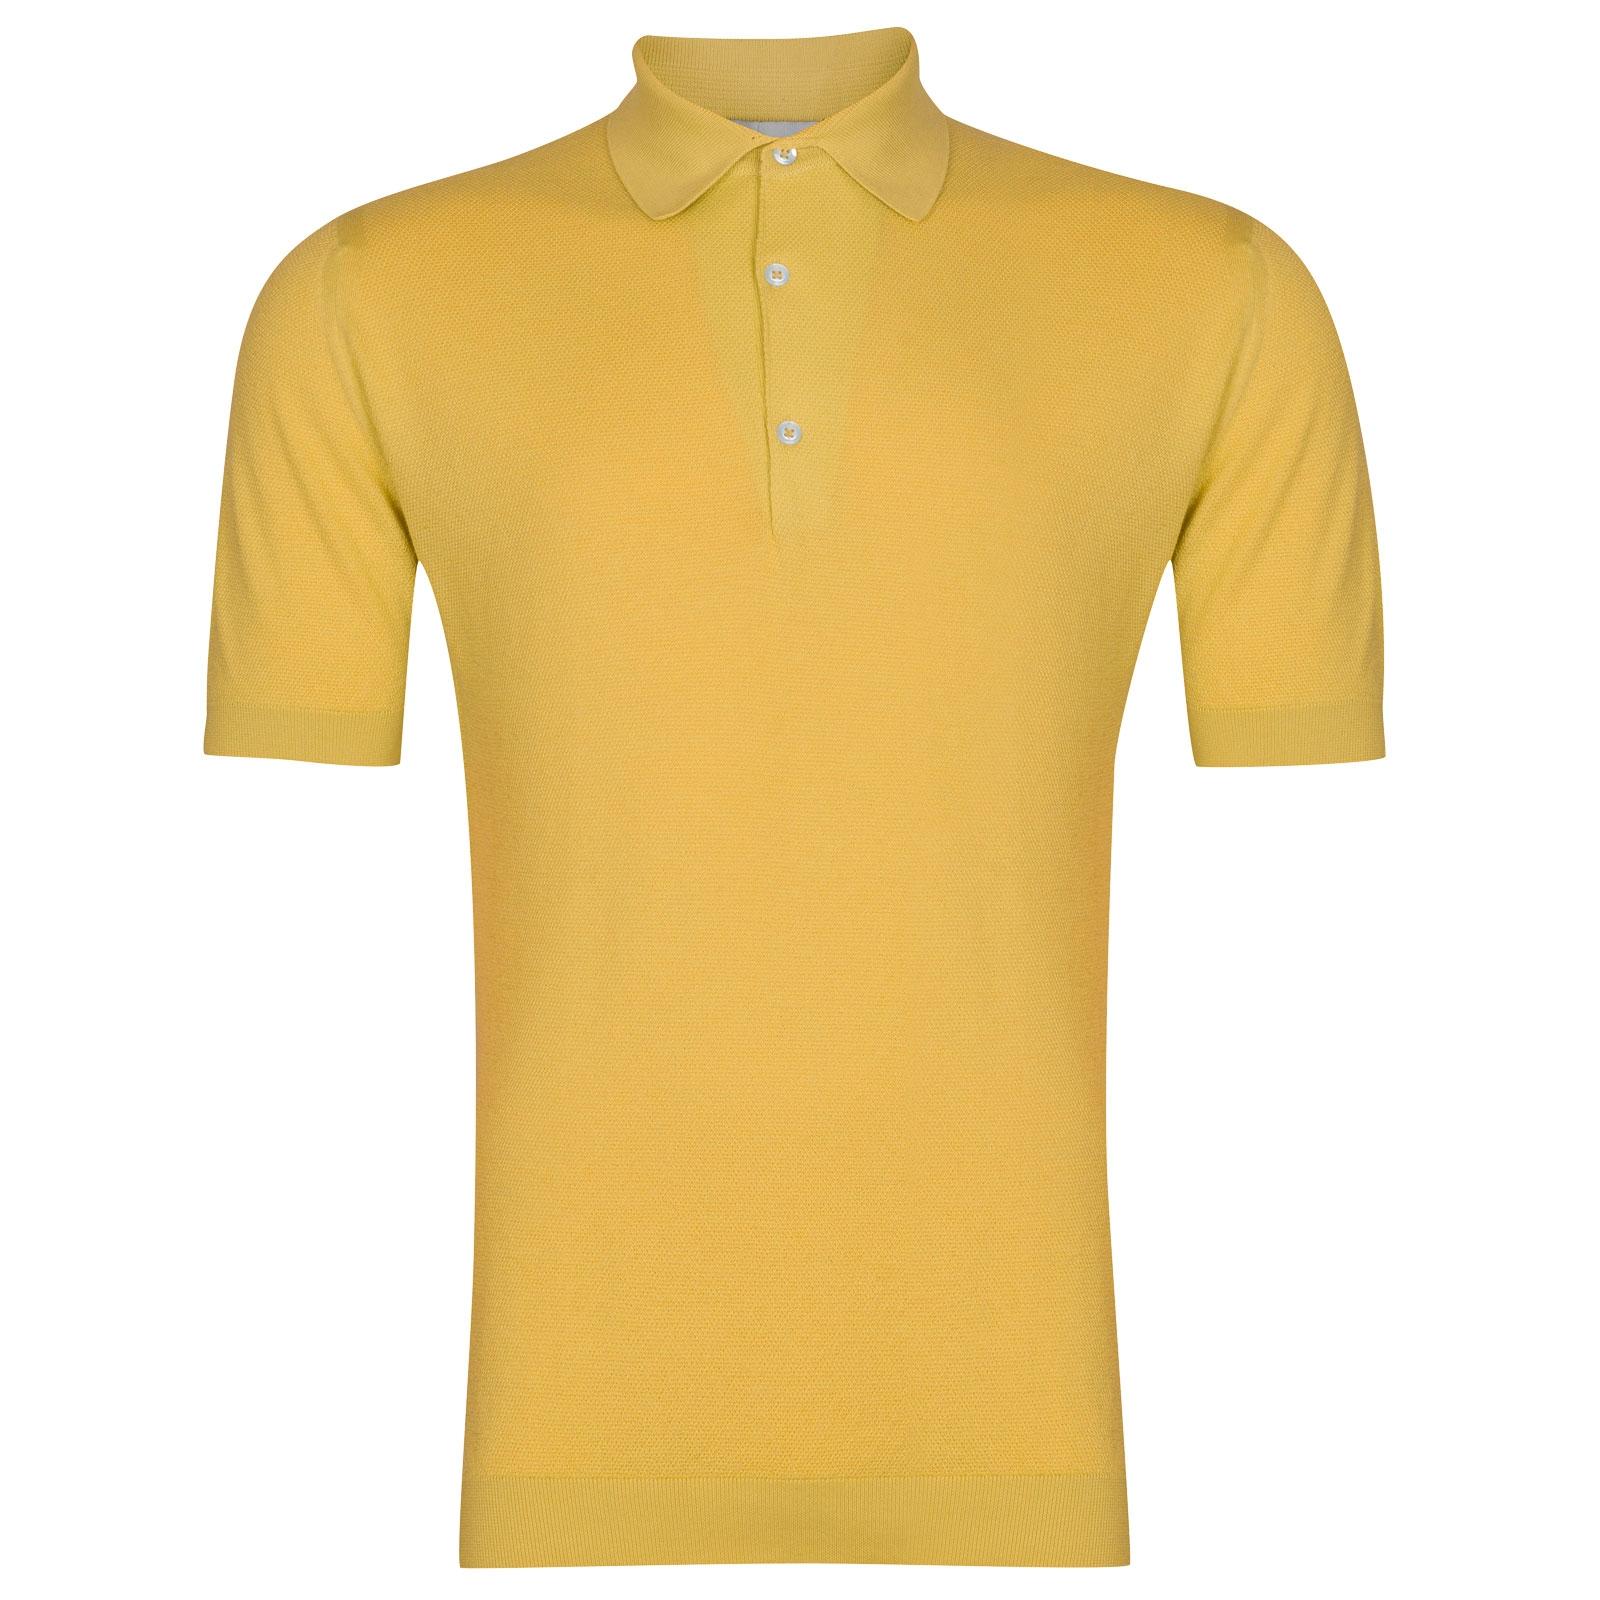 John Smedley Roth in Yellow Bloom Shirt-MED